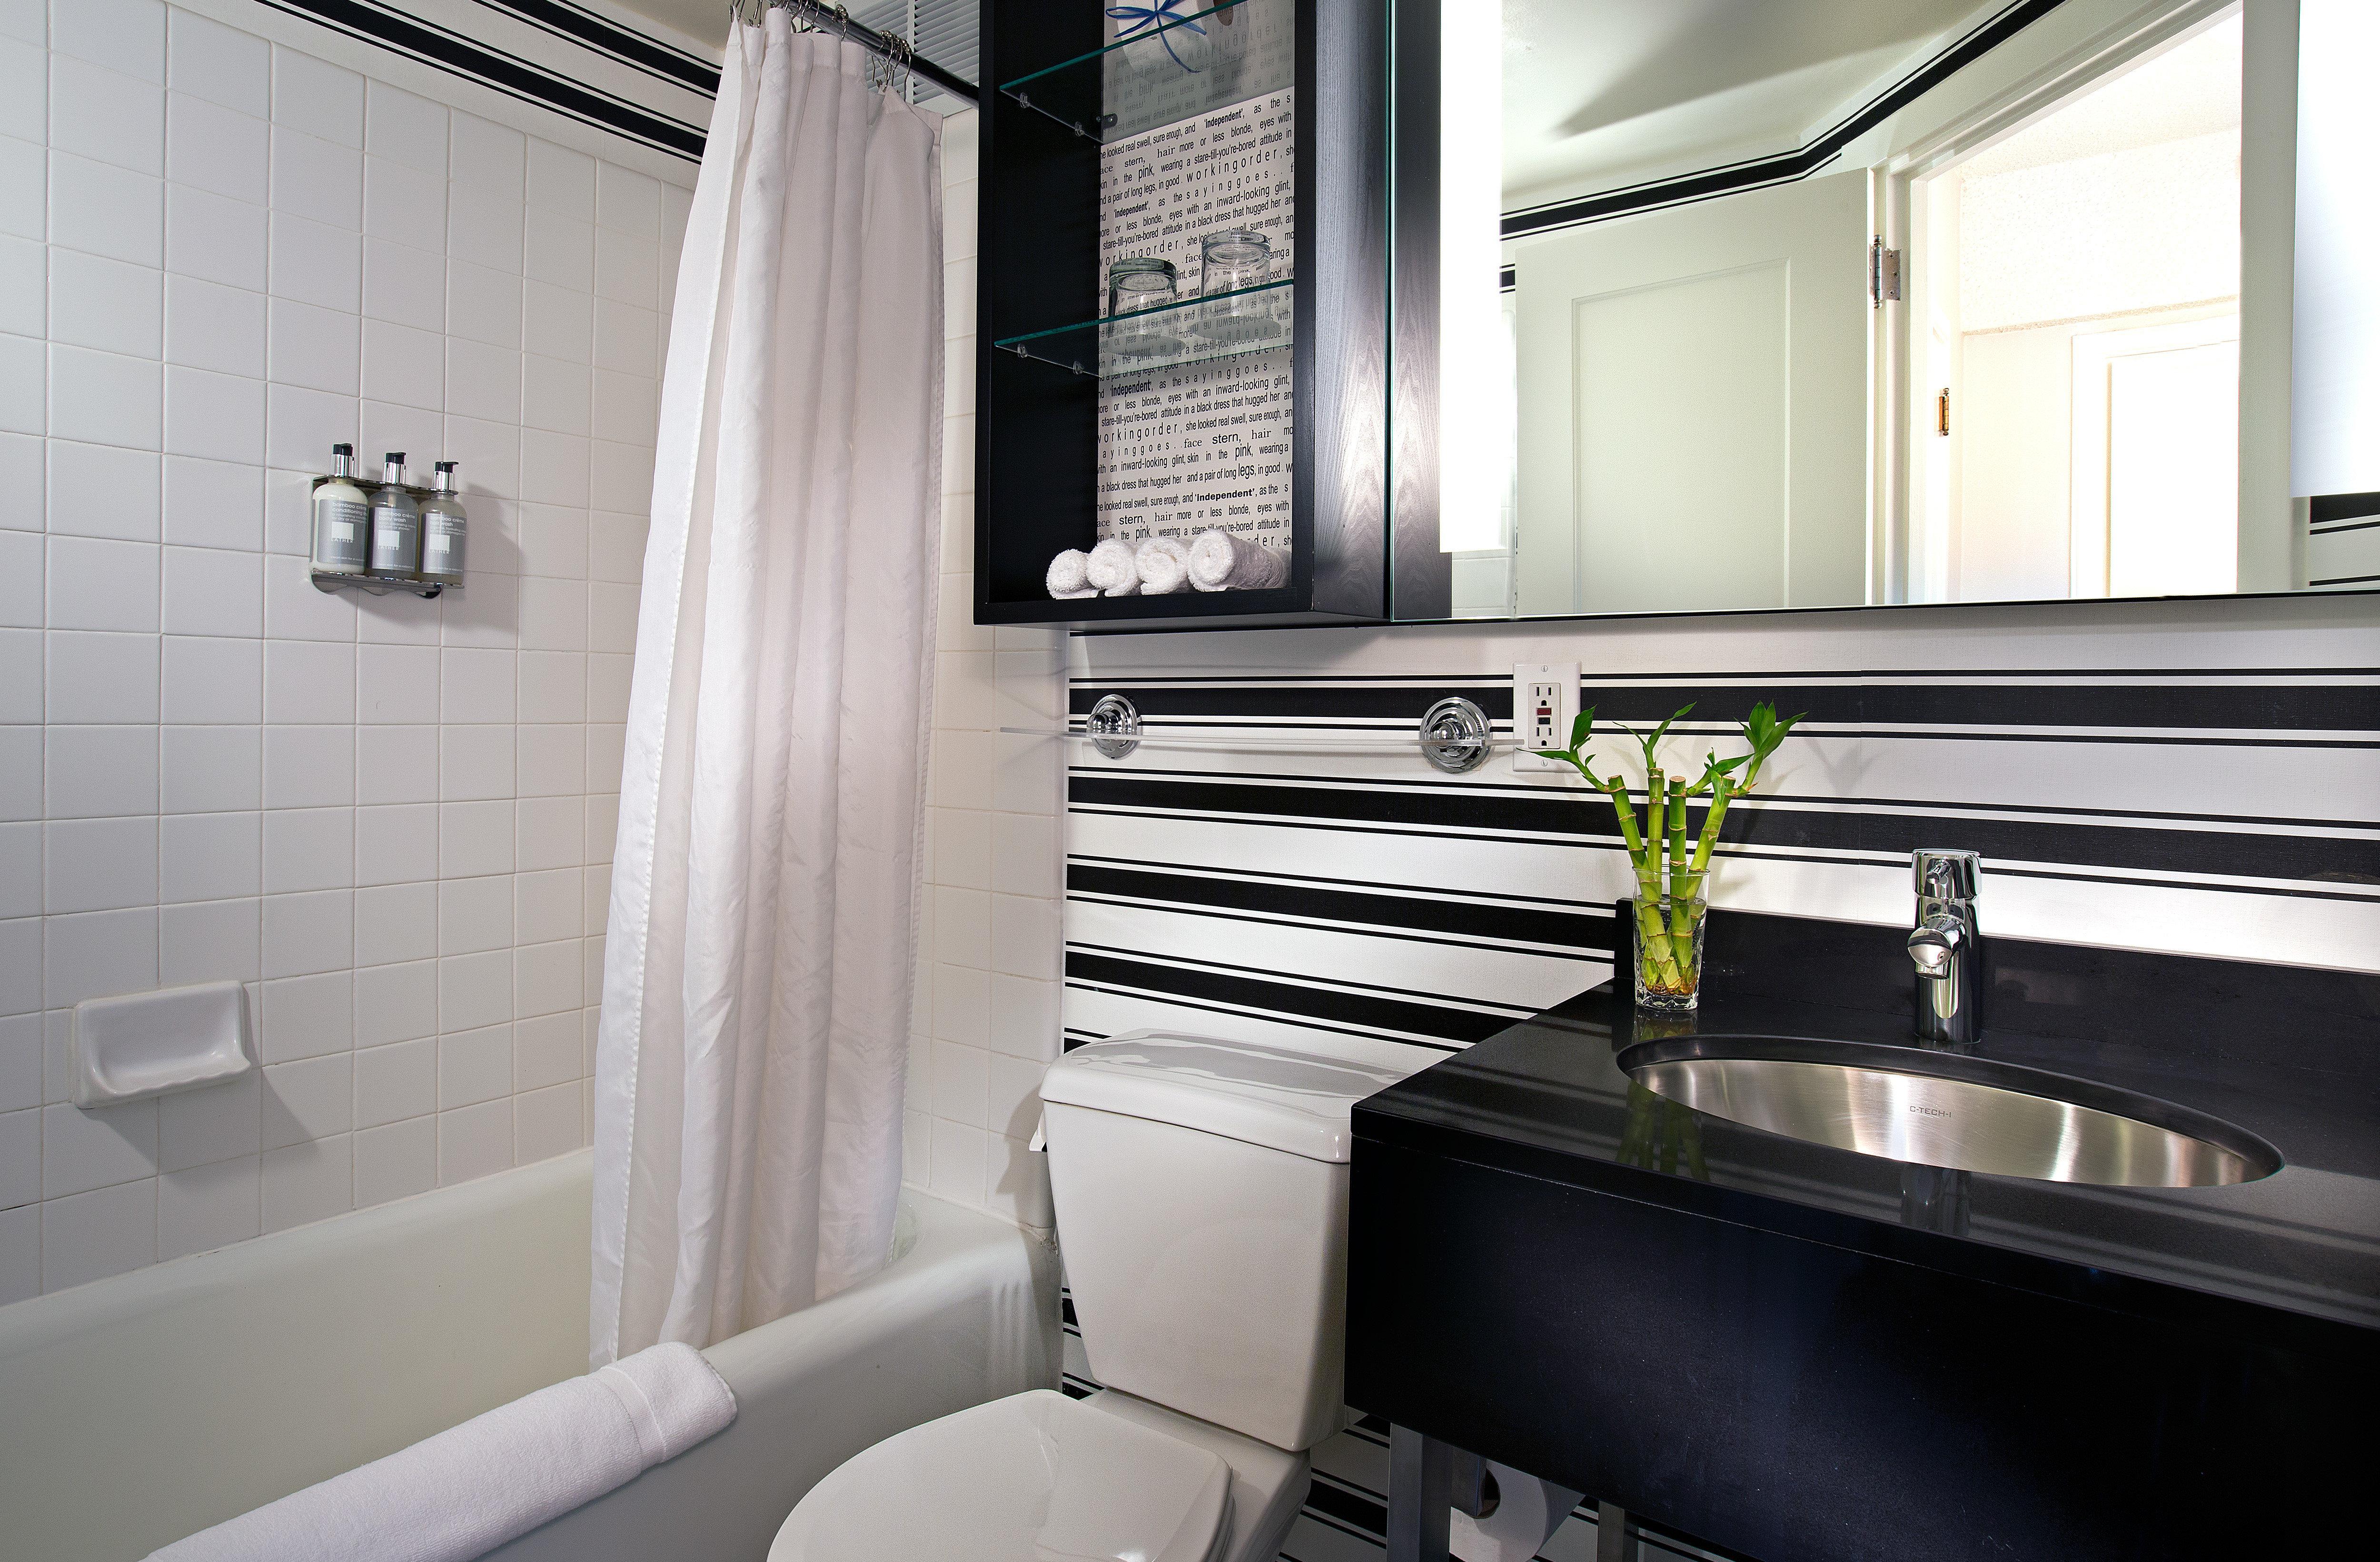 Bath Historic Modern bathroom property home sink Suite tub